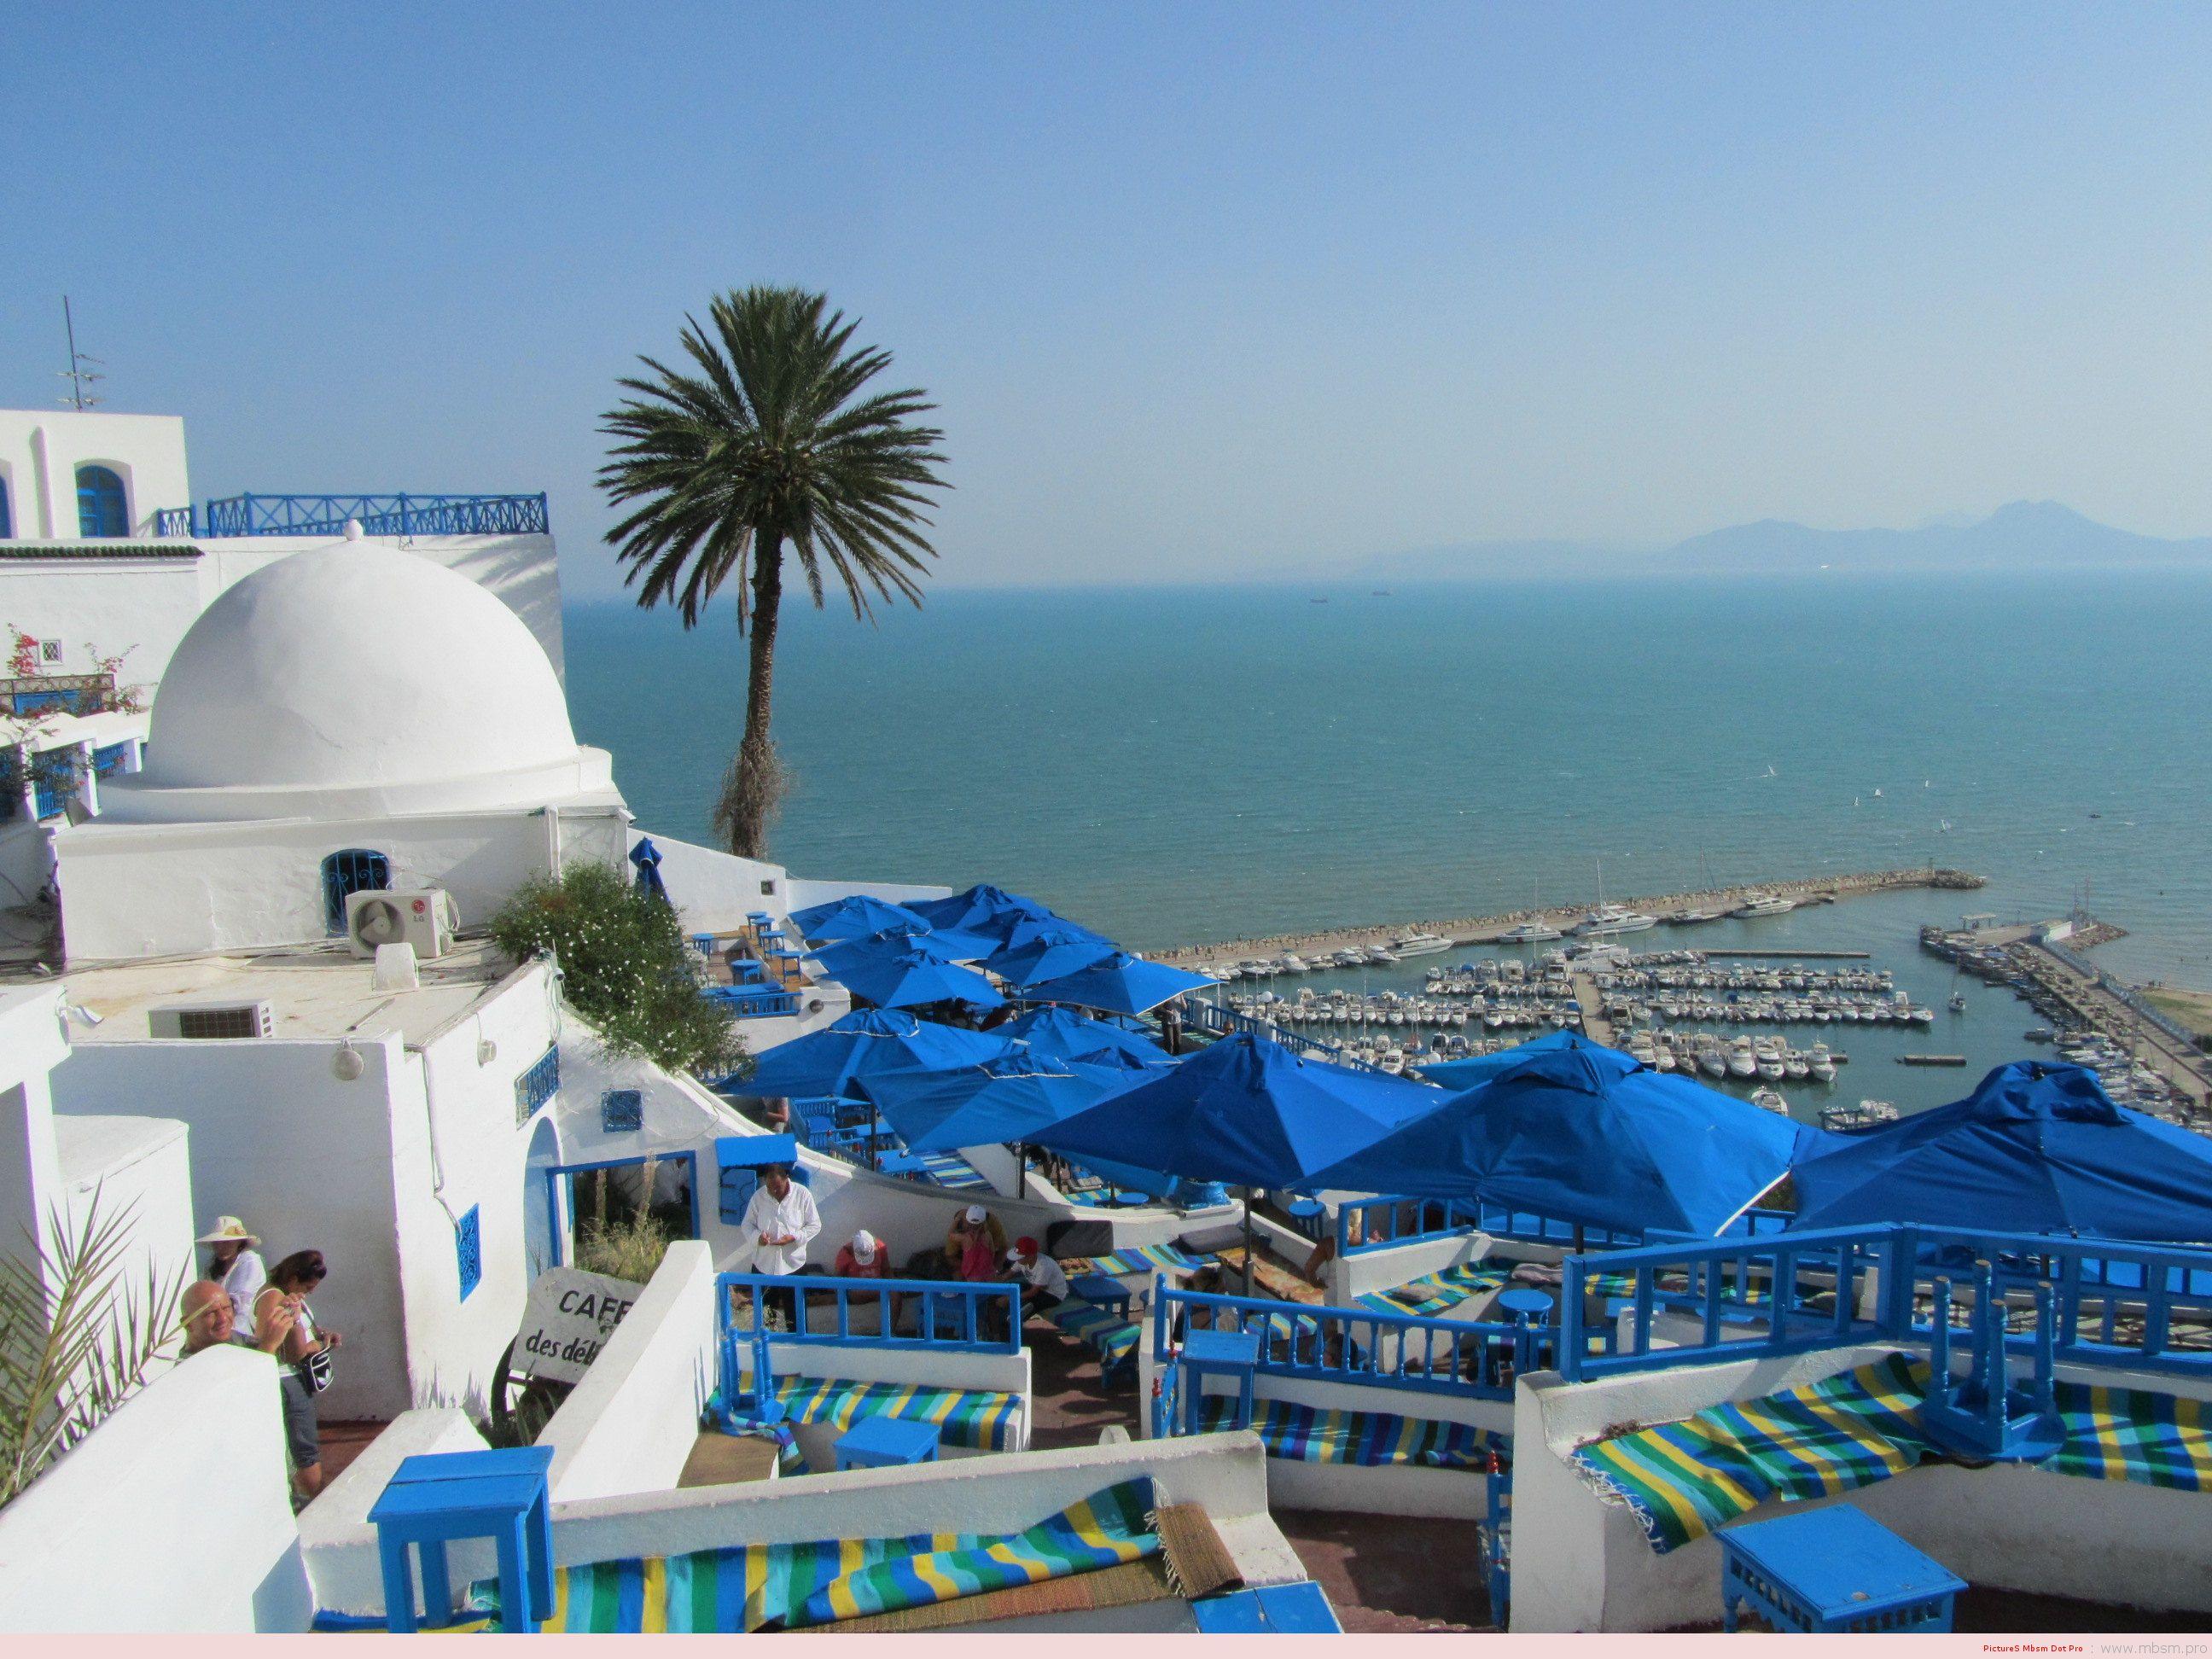 mbsm-dot-pro-wwwmbsmpro--bienvenue-au-caf-des-dlices-ma-tunisie